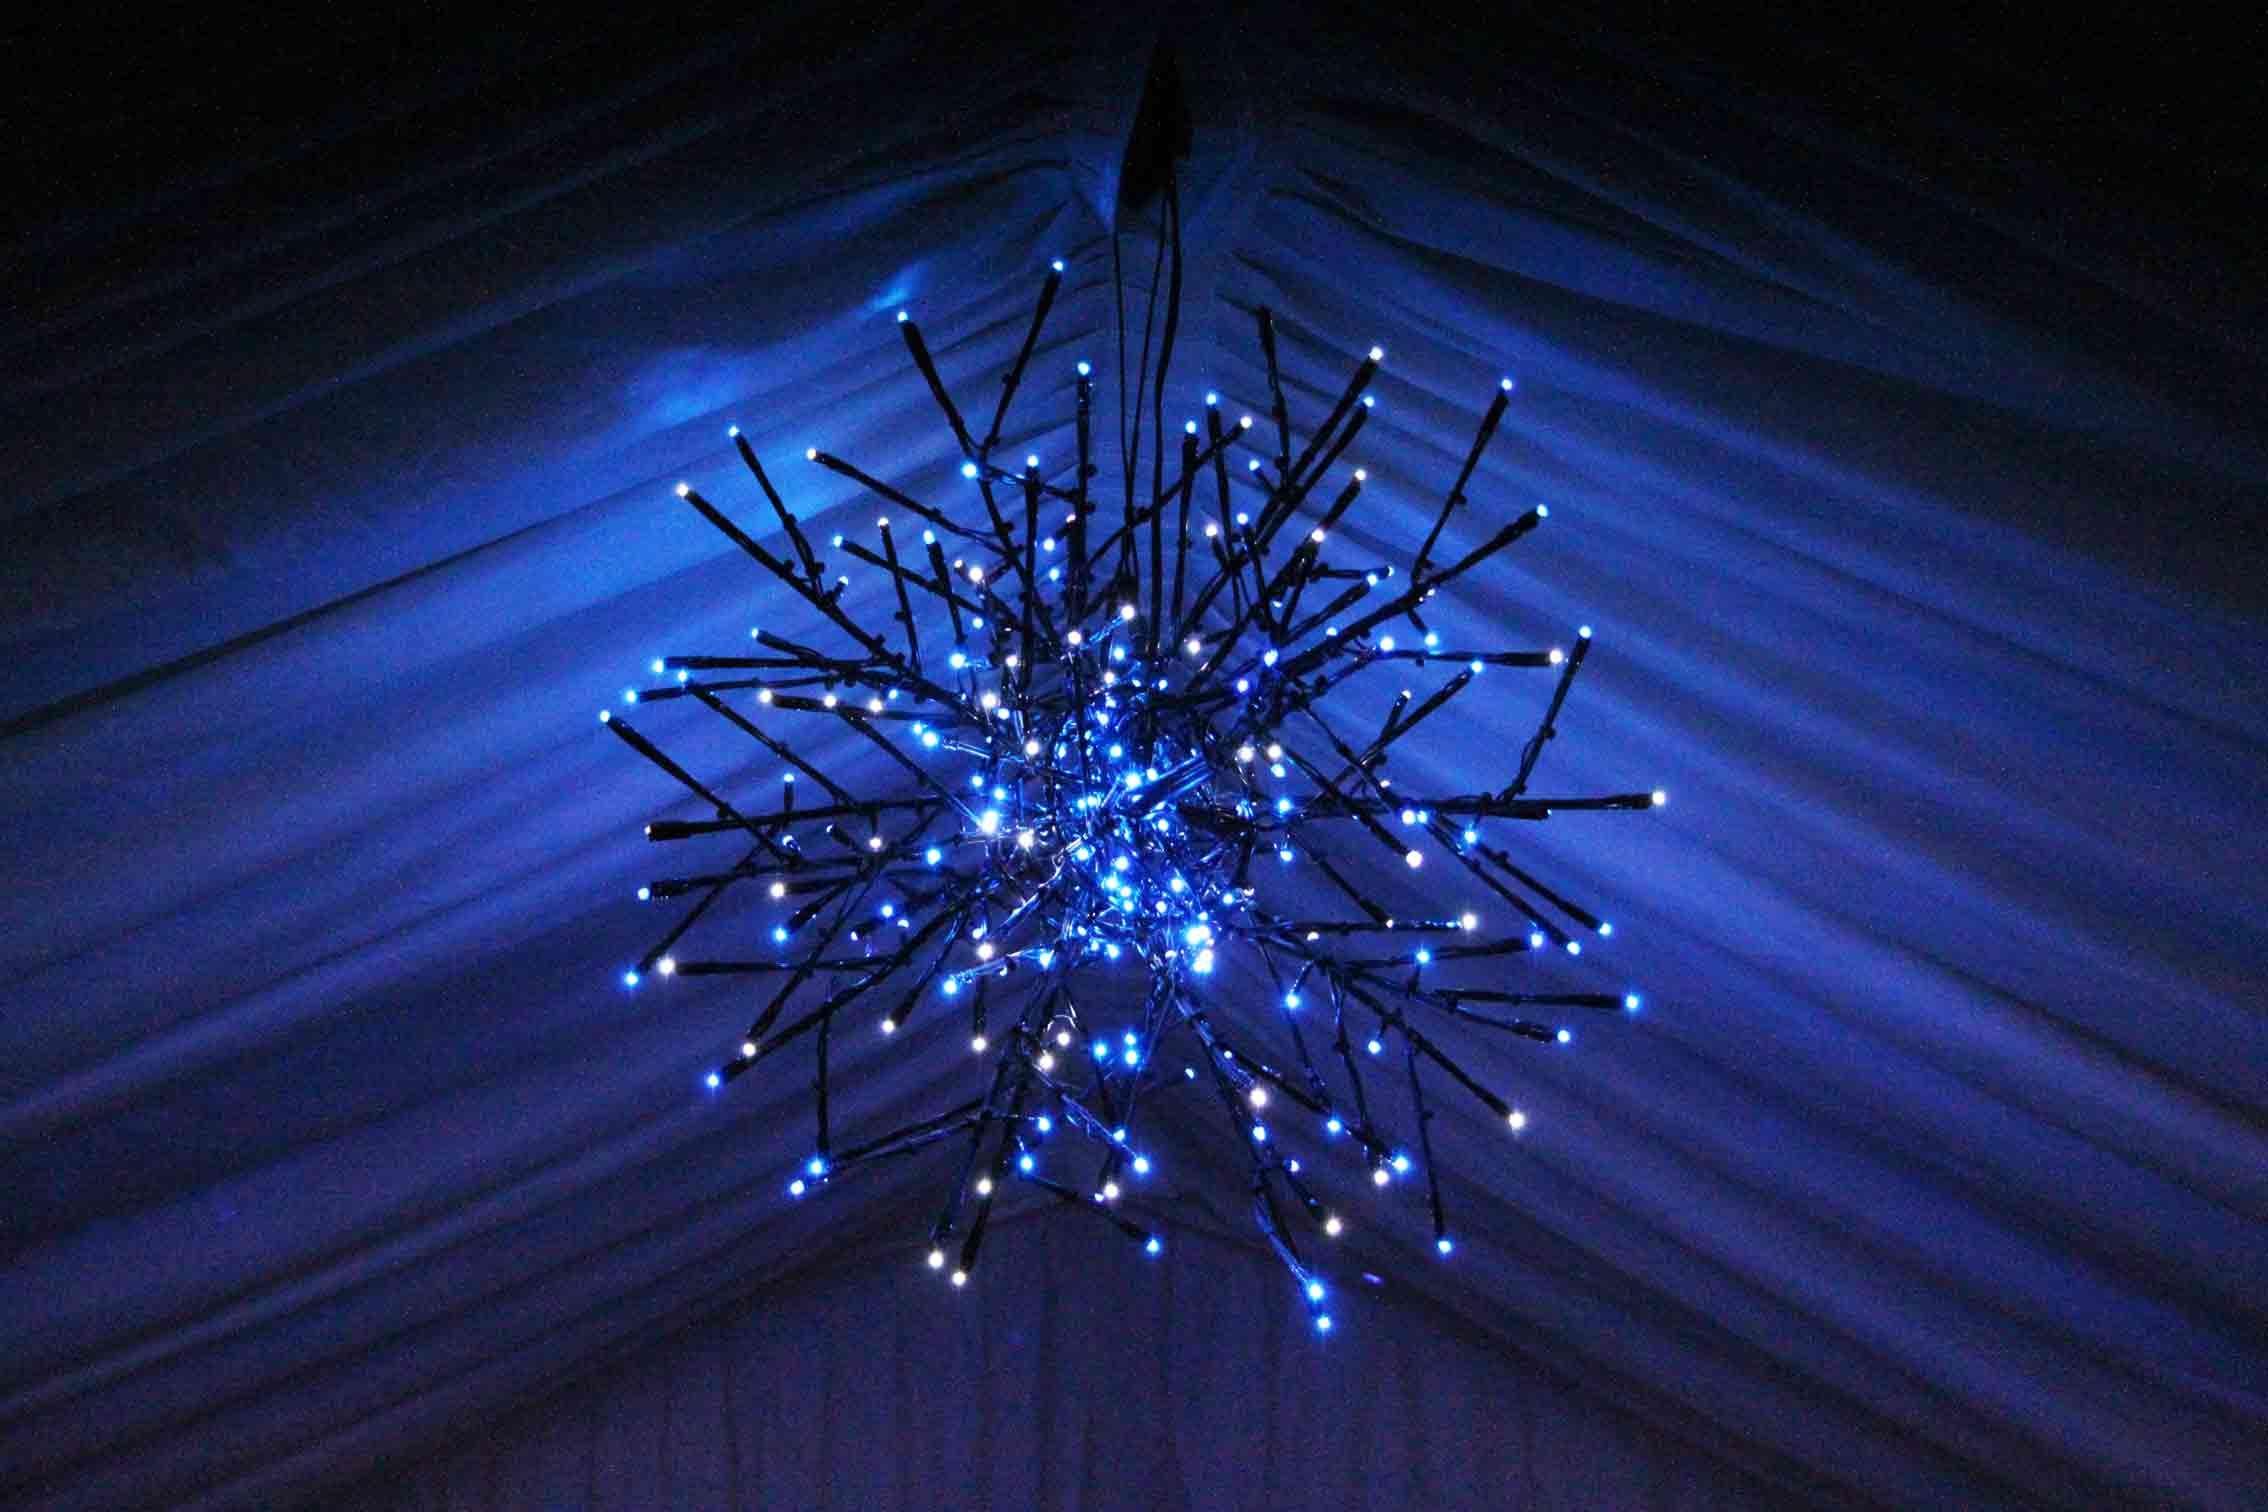 blue concert flashing stock lights background lighting stage sports stadium video